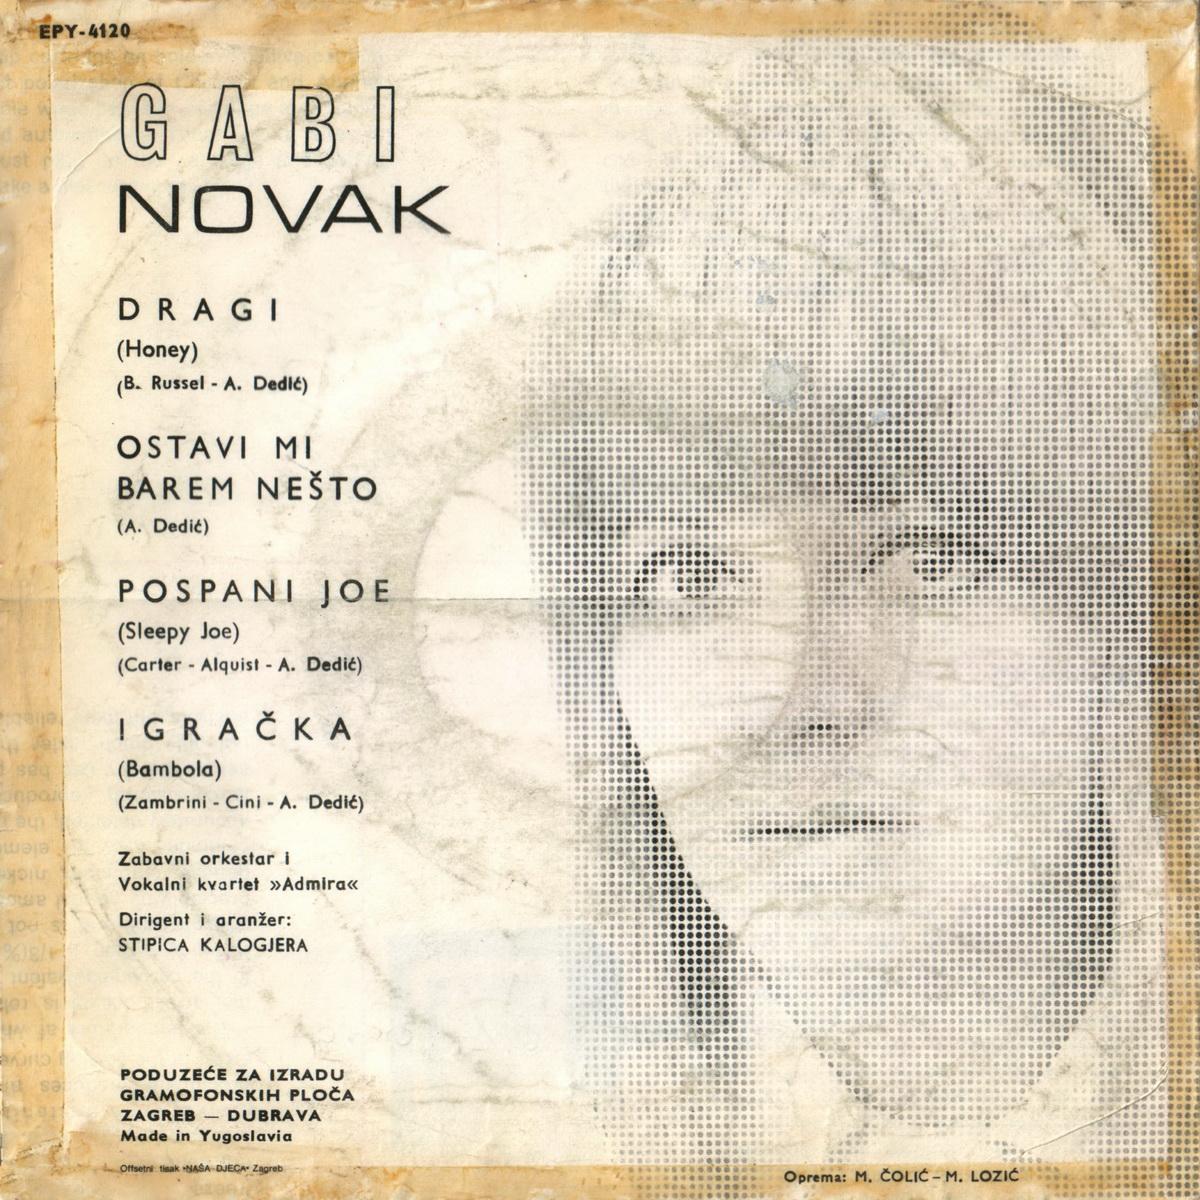 Gabi Novak 1968 Dragi B